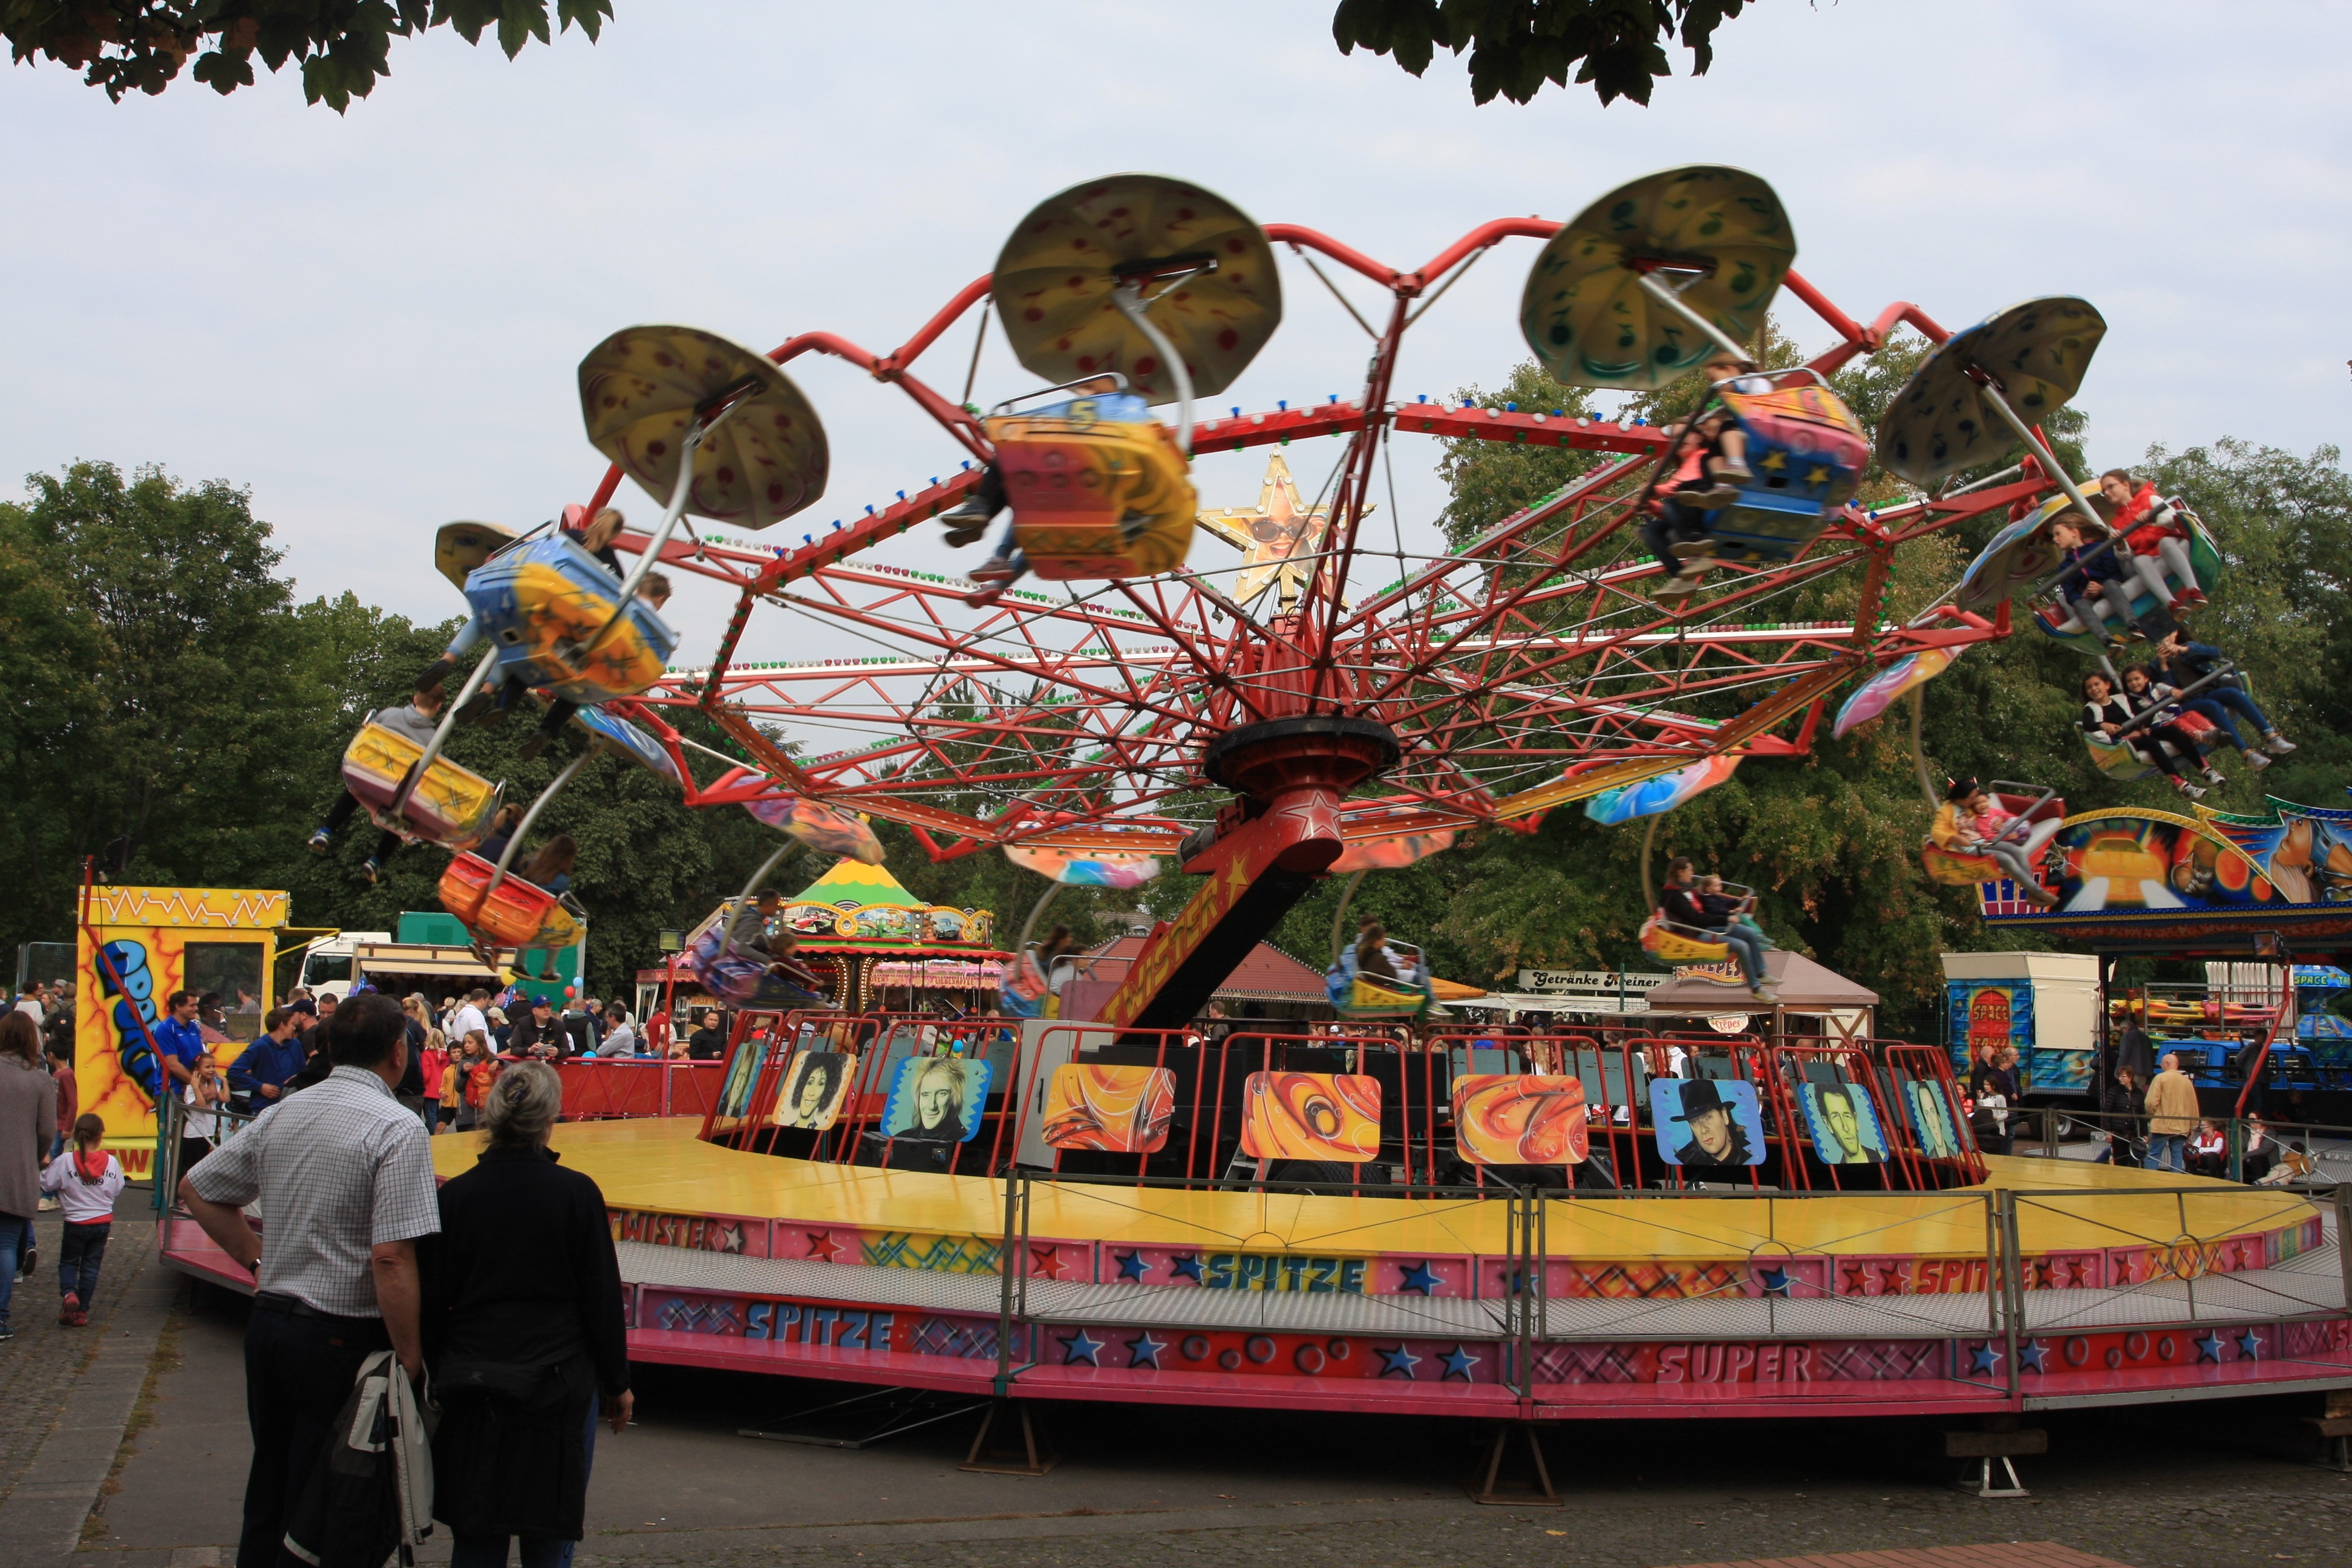 Kinderkarussell auf dem Festplatz während der Krifteler Kerb.